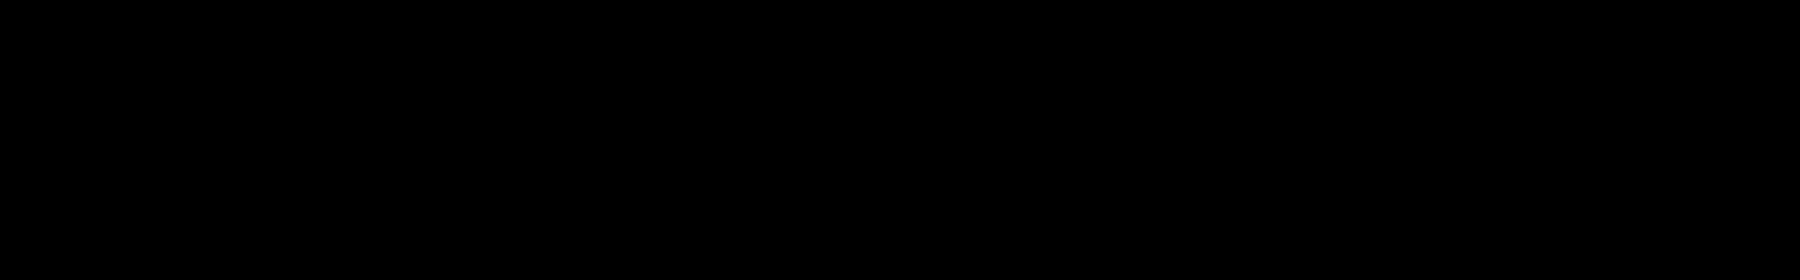 Drip N Drill audio waveform